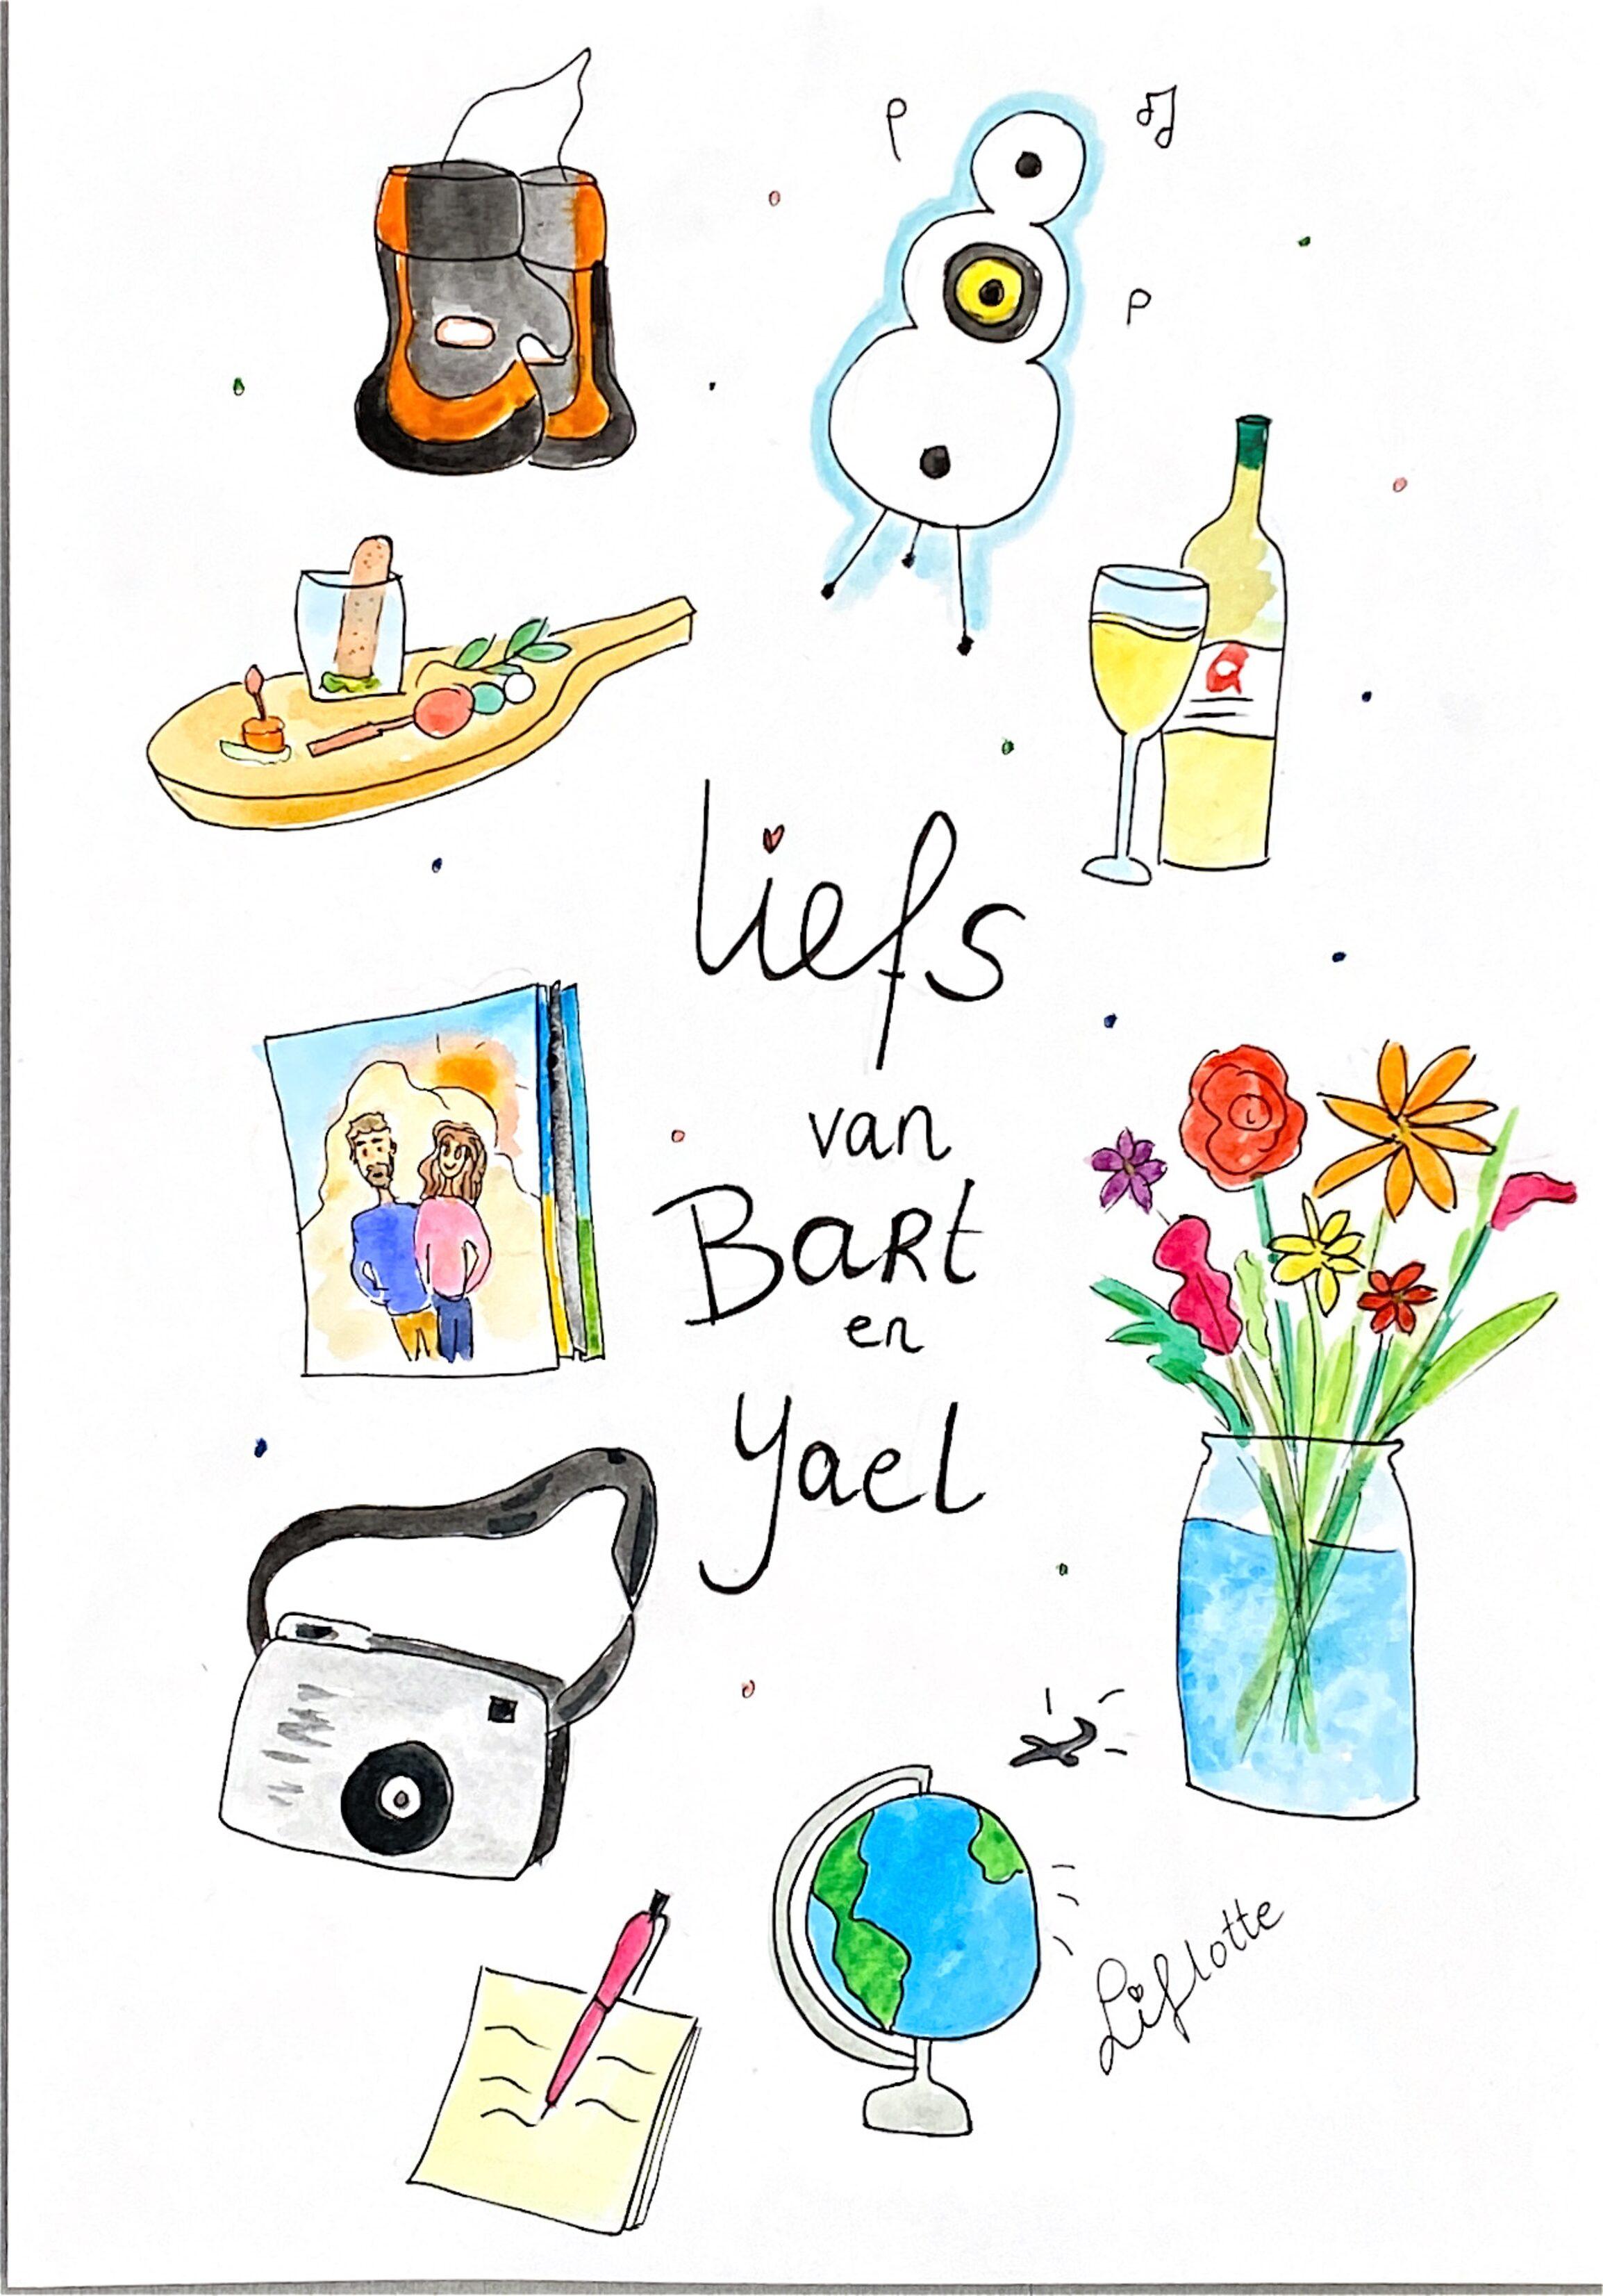 Liflotte favokaart Yael 2020